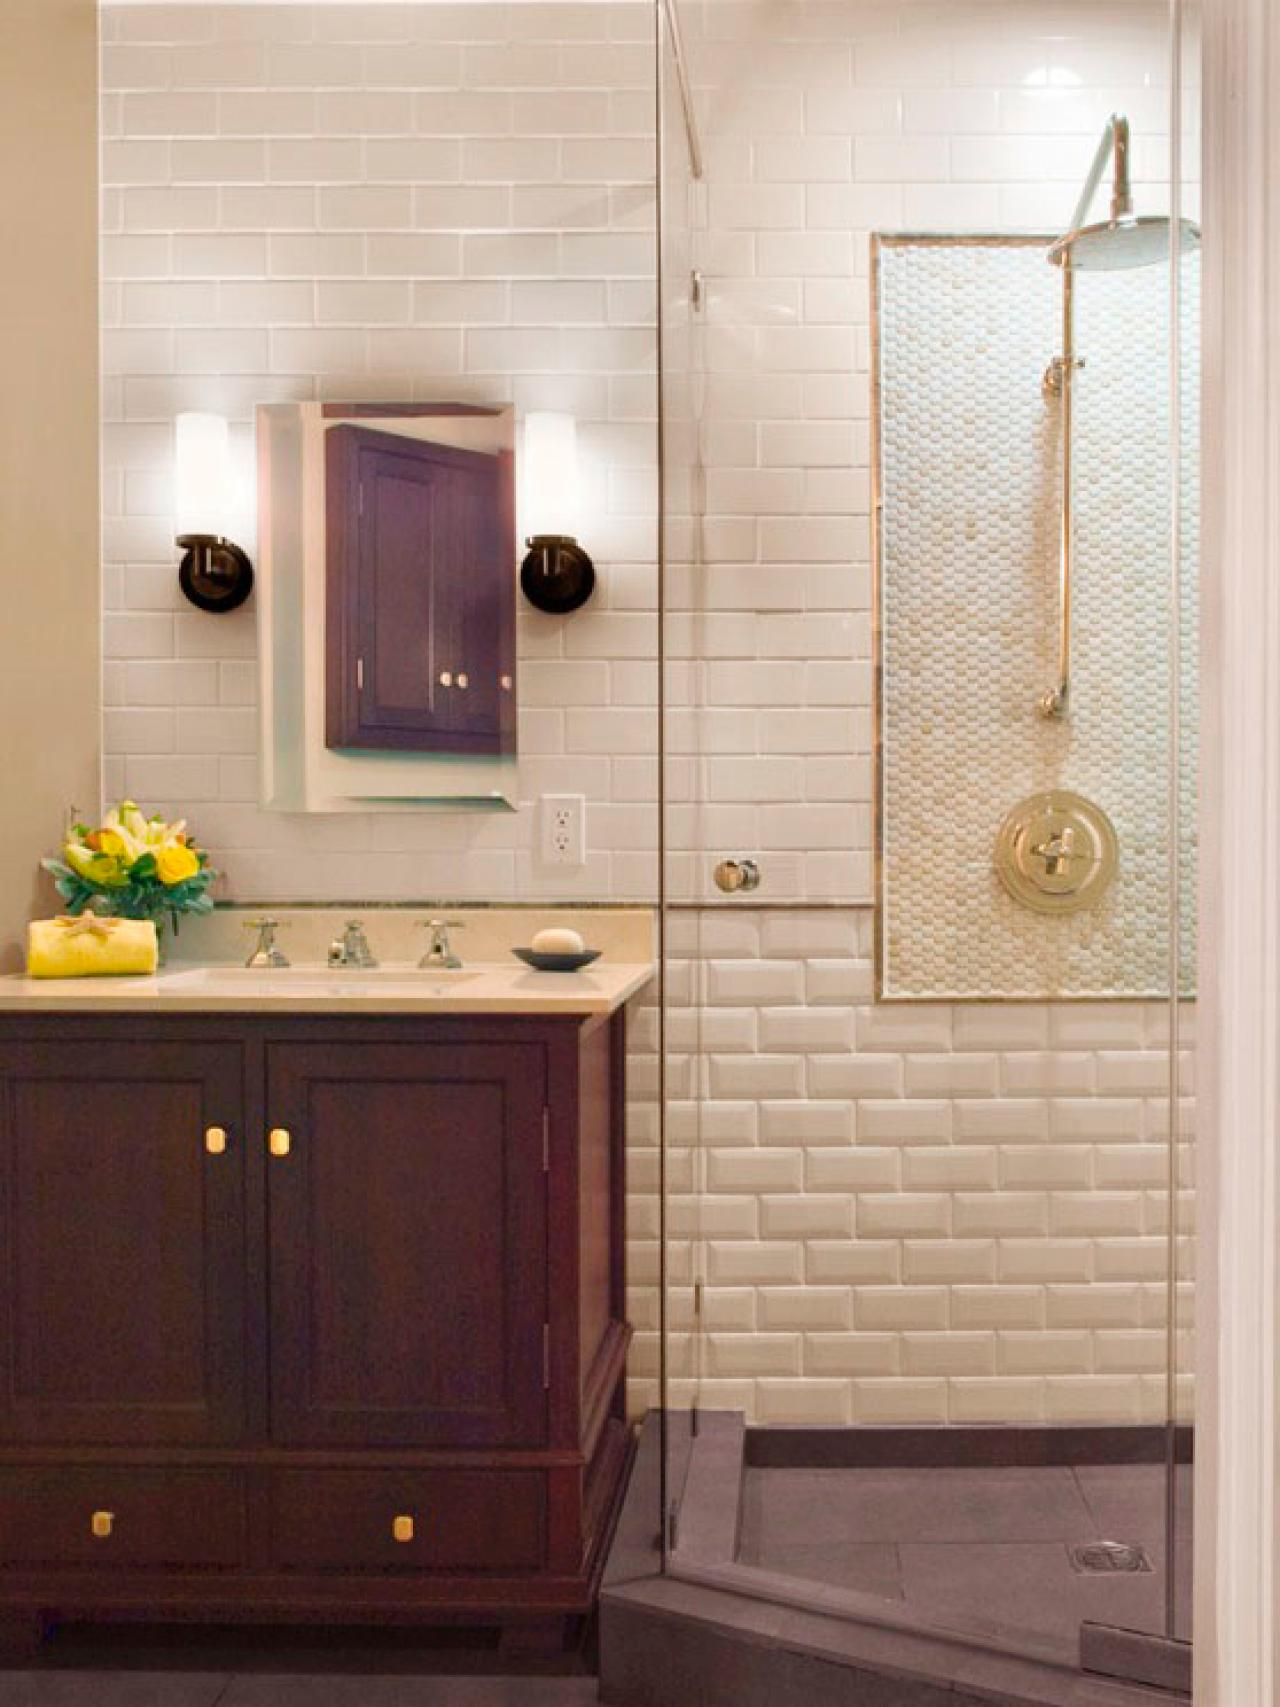 three quarter bathrooms - How To Plan A Bathroom Remodel